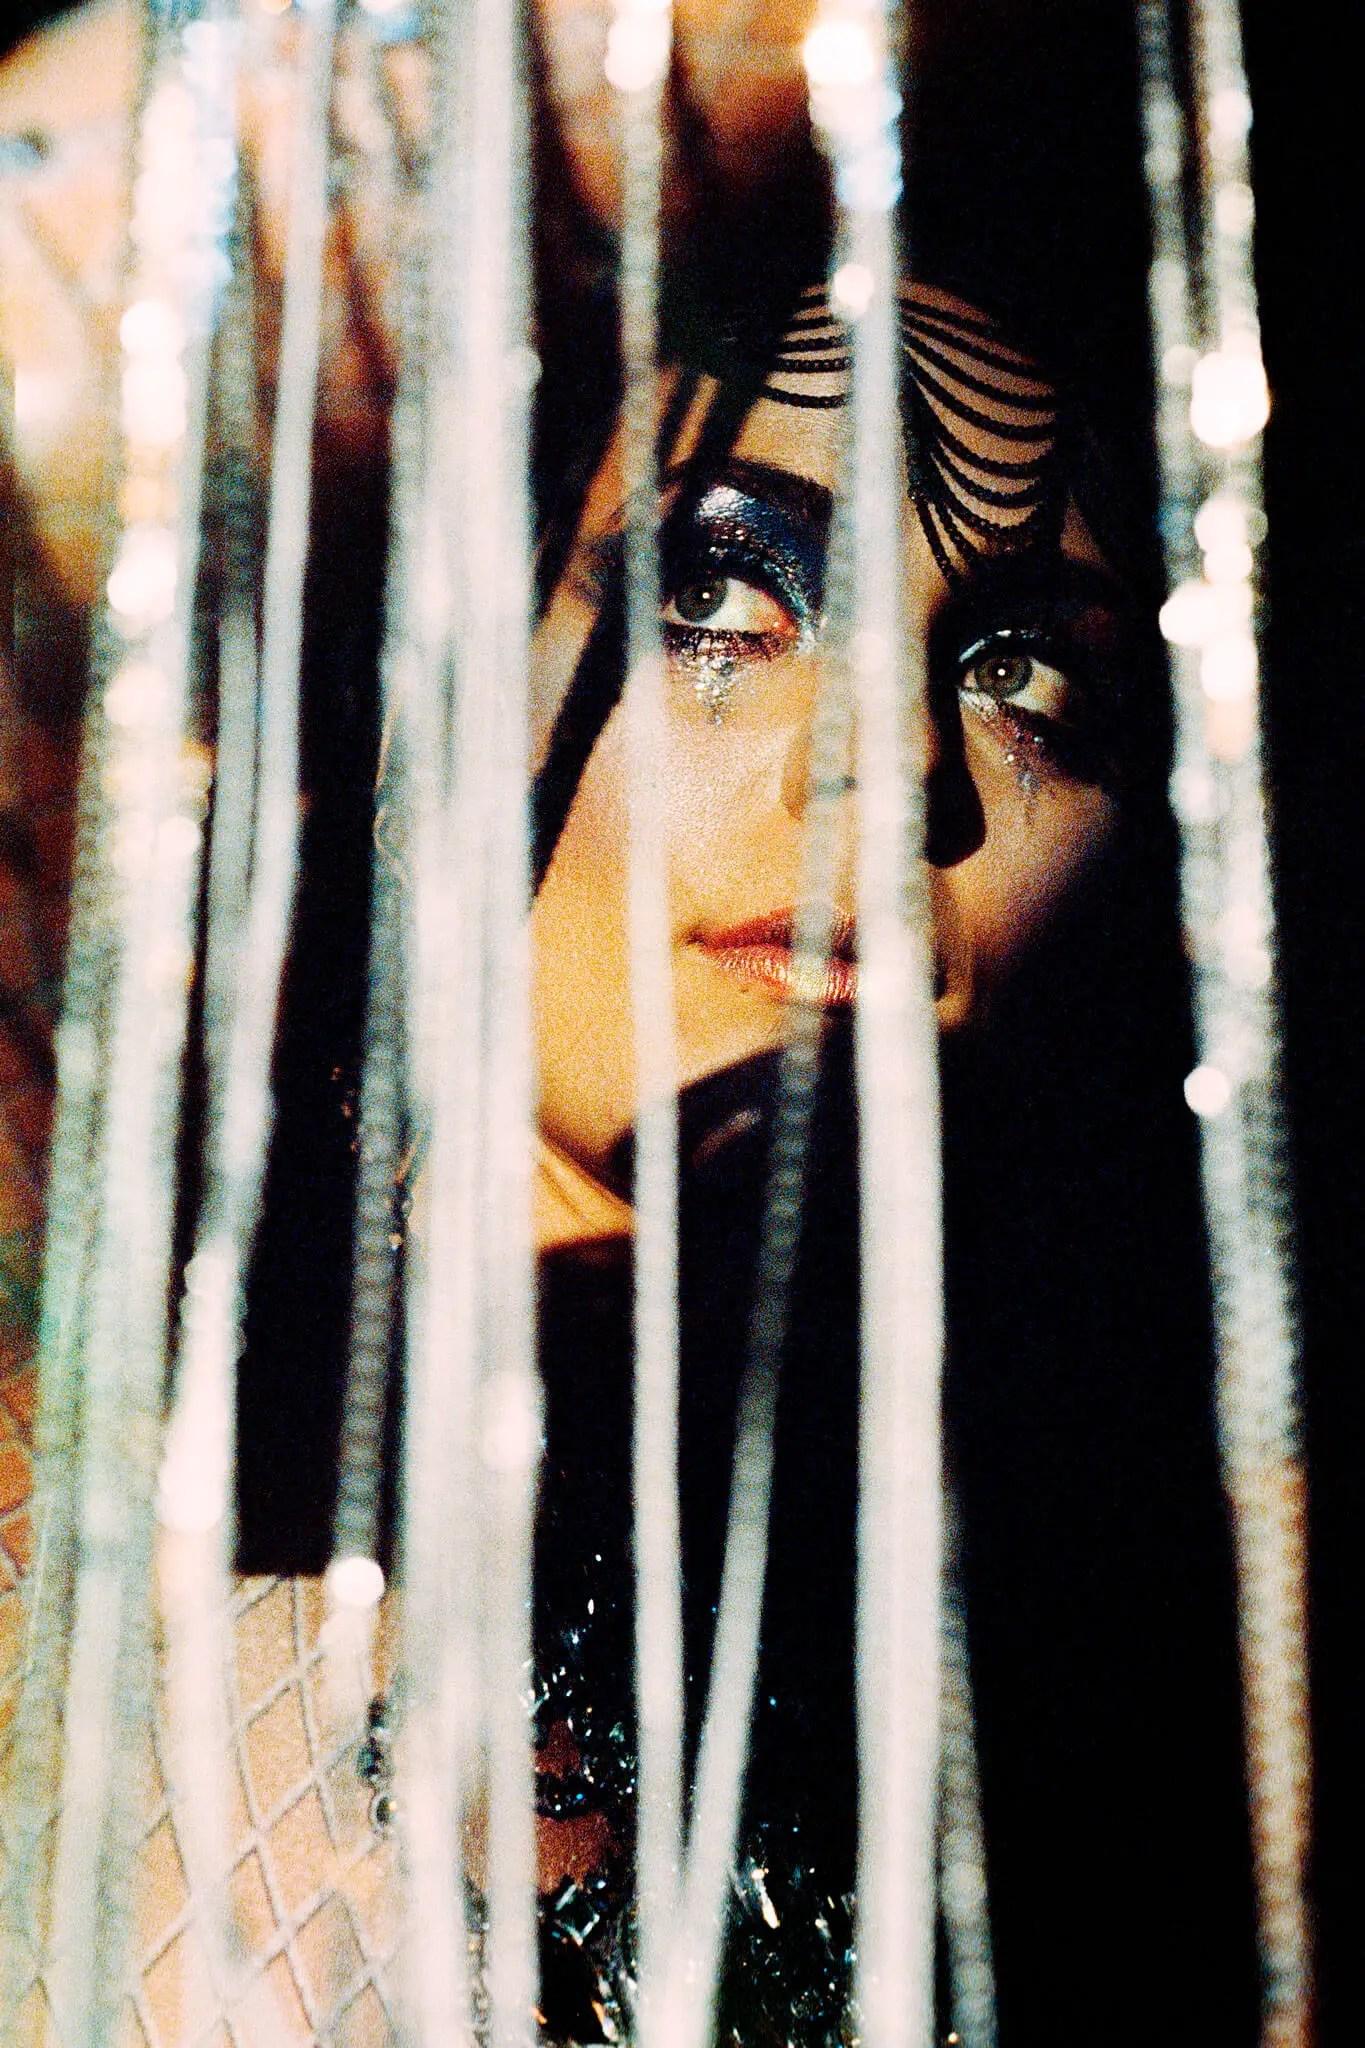 Diamond lights - Breanna Barbara, musician - Leica R6 + Leica 60mm Macro-Elmarit f-2.8, Kodak 5219 Vision3 500T